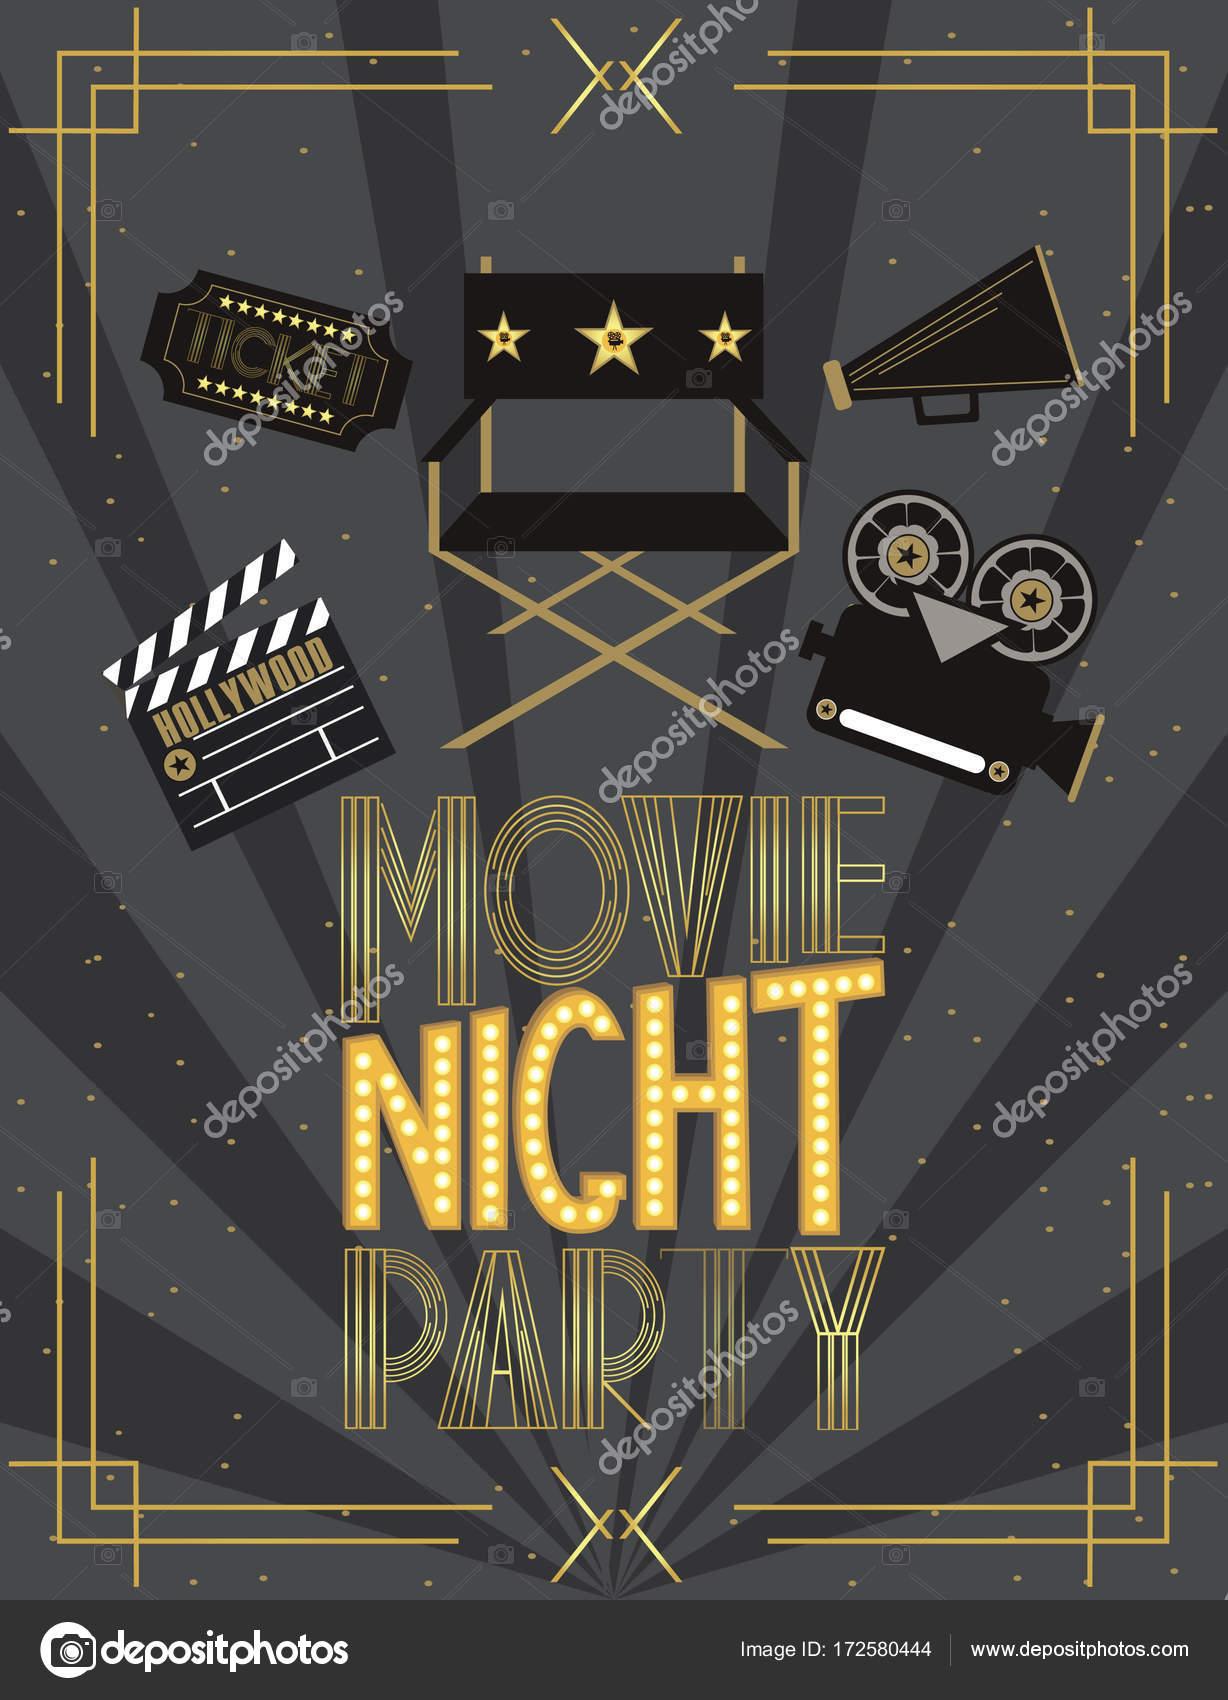 Nacht-Film-Party-Einladung-Karte — Stockvektor © MioBuono12 #172580444